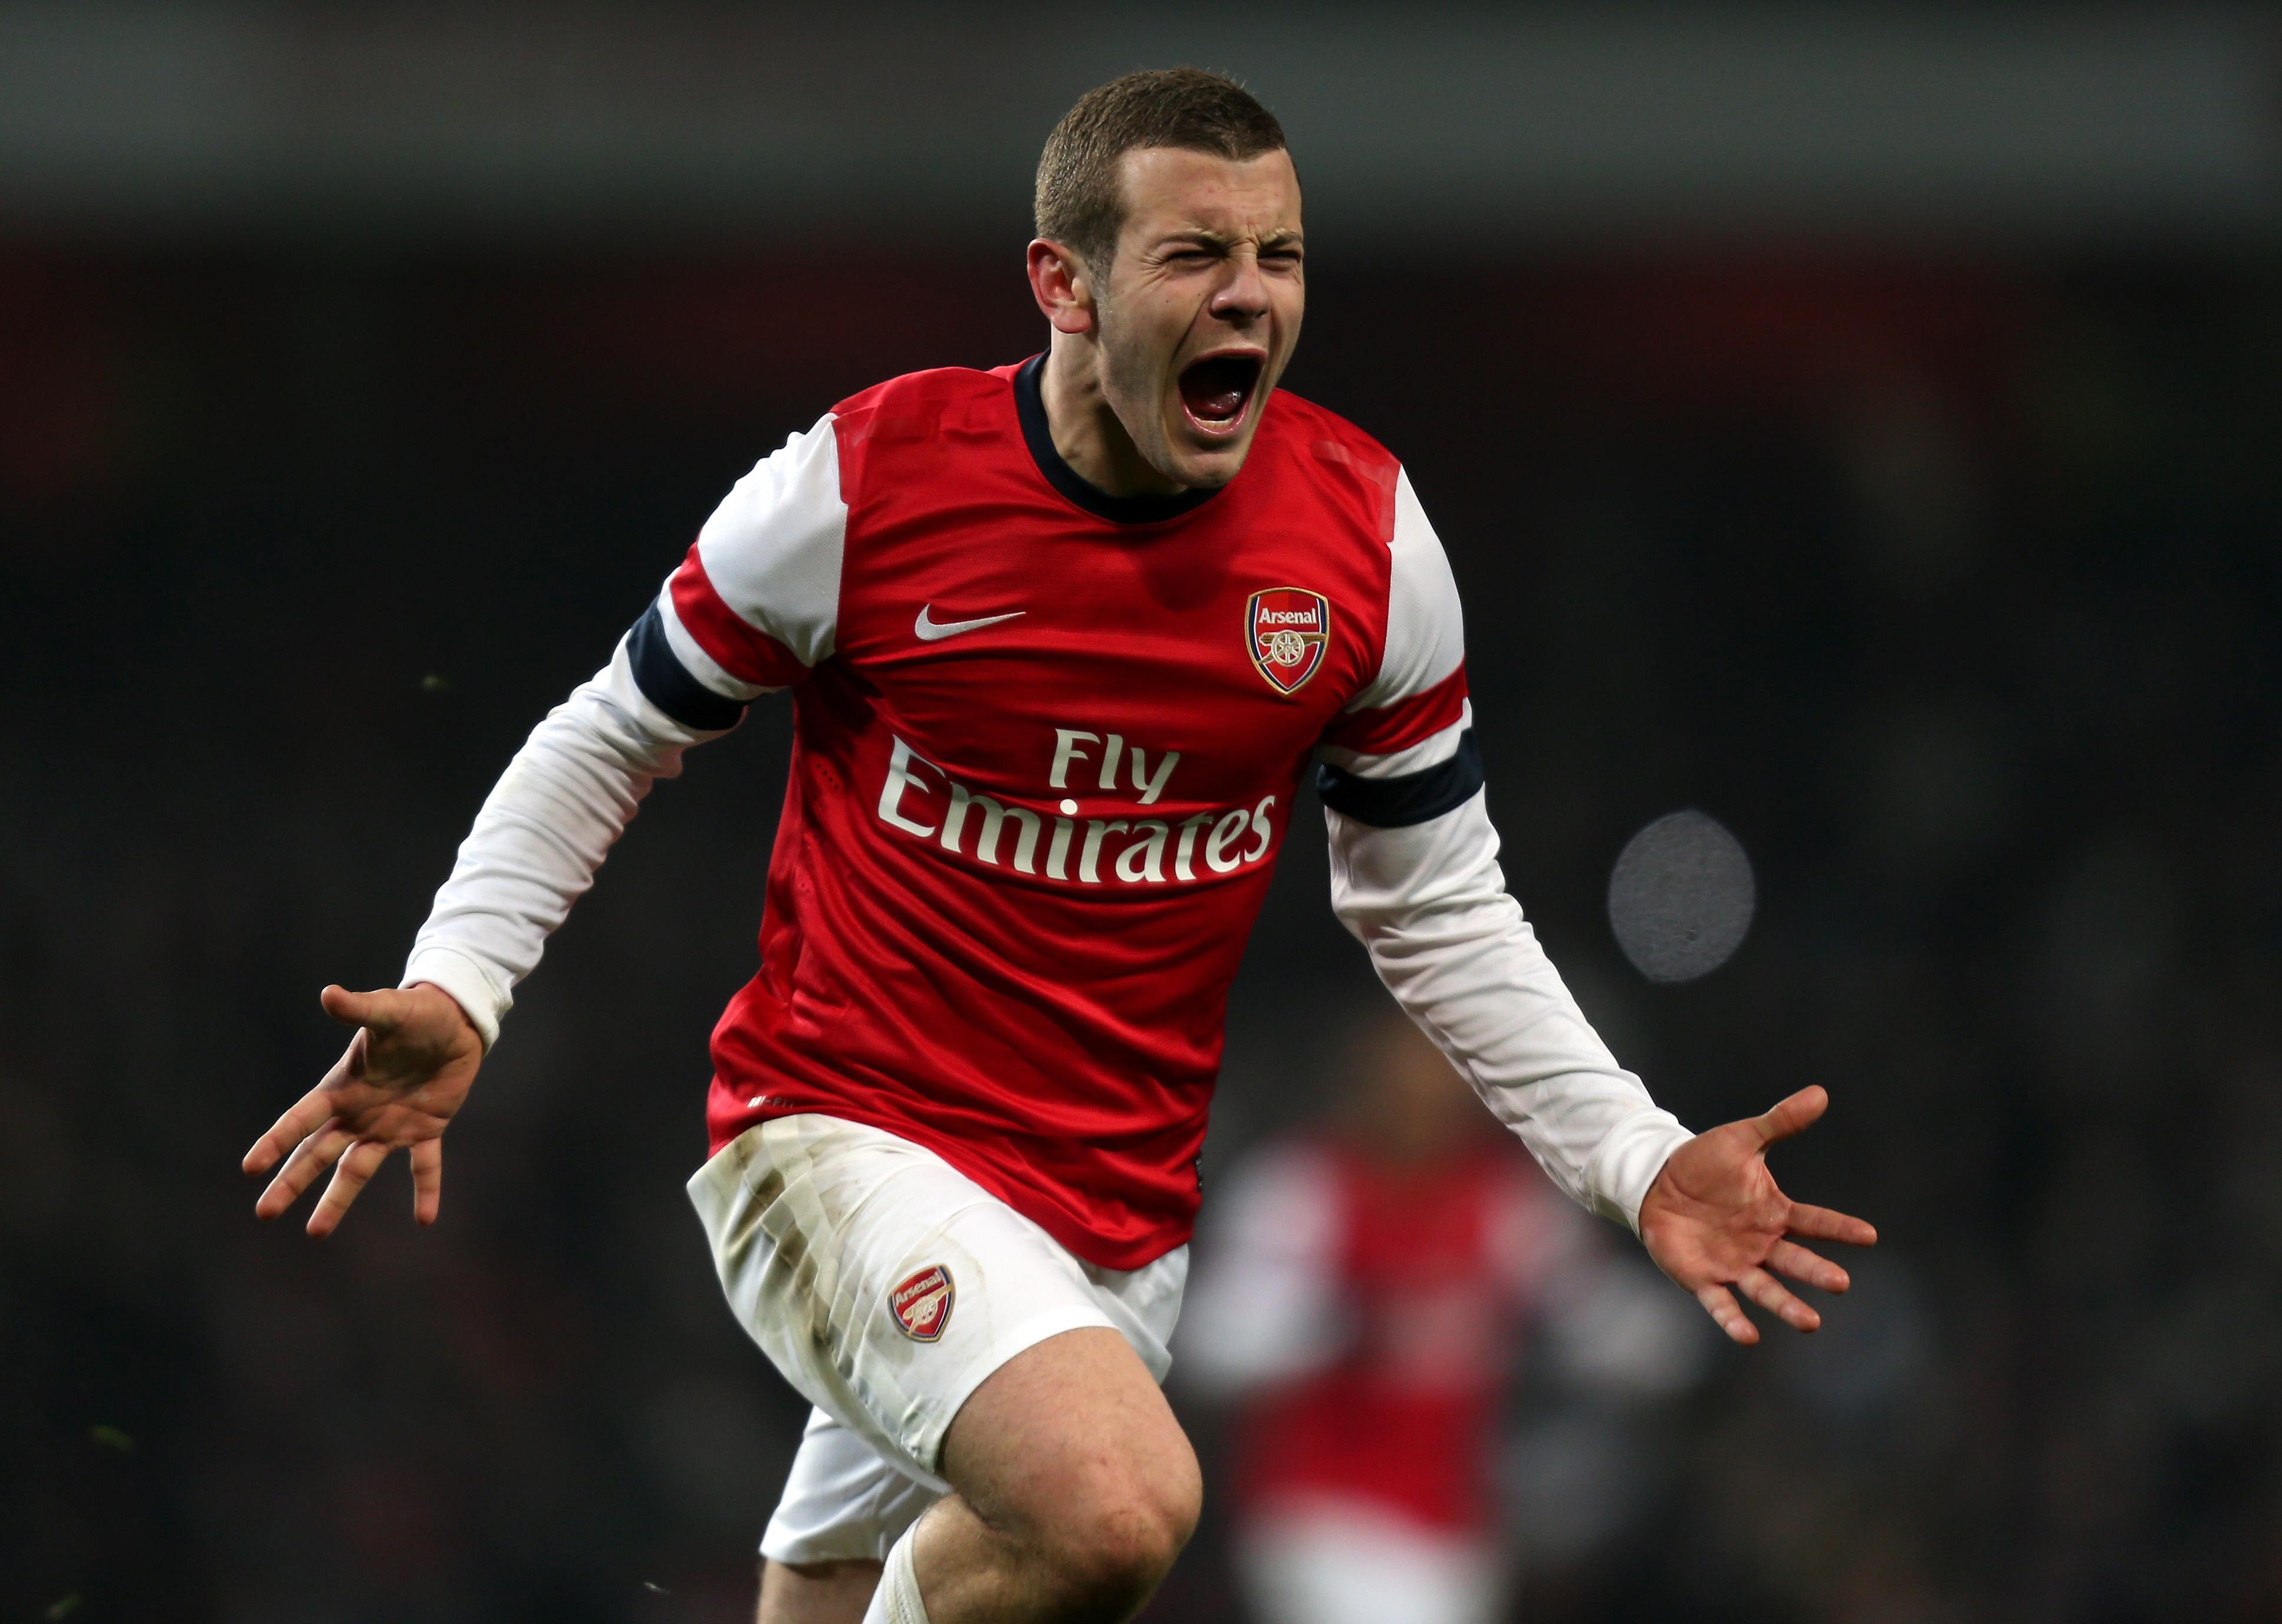 Soccer - FA Cup - Third Round Replay - Arsenal v Swansea - Emirates Stadium